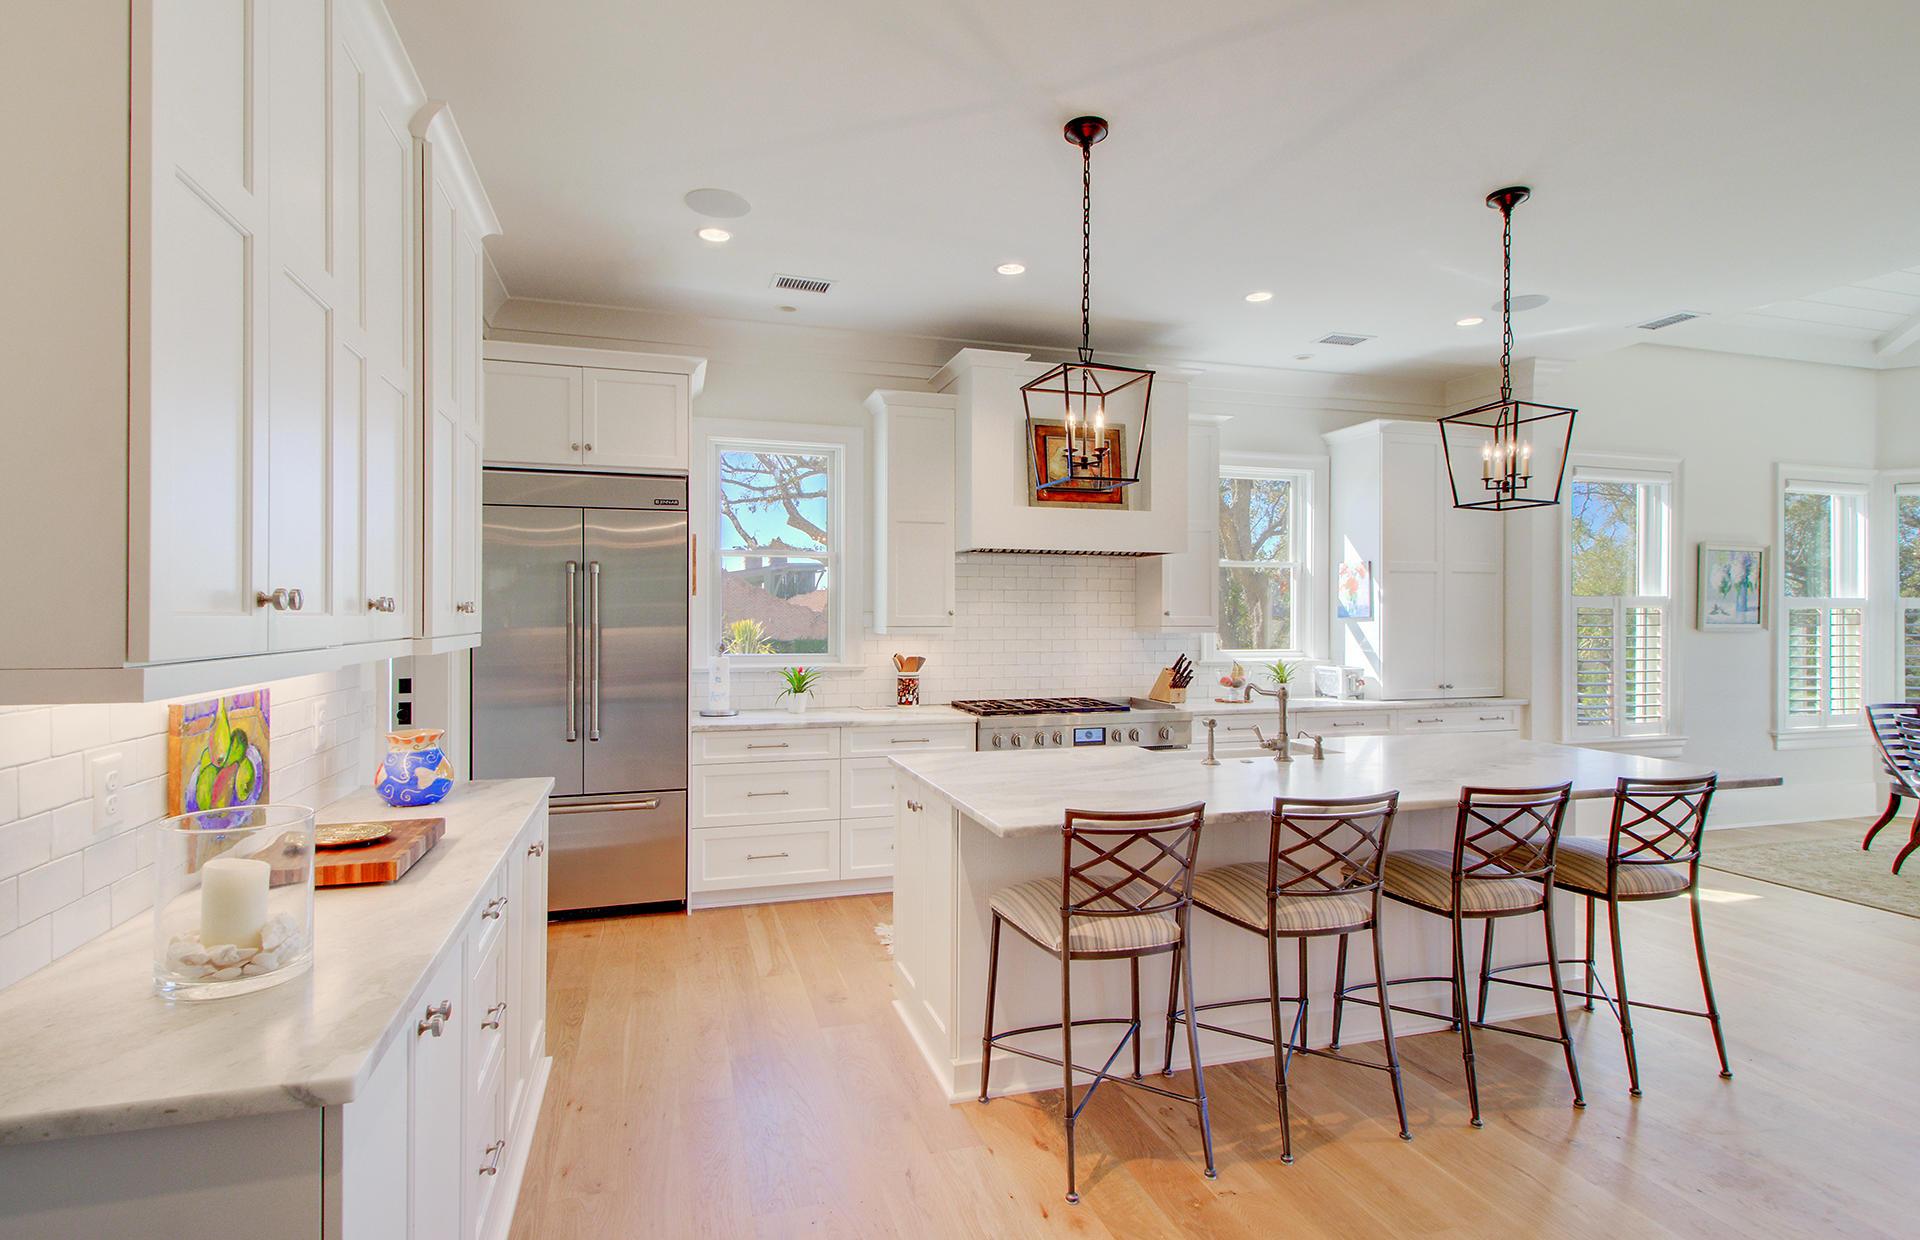 Beresford Hall Homes For Sale - 253 Grand Park, Charleston, SC - 9